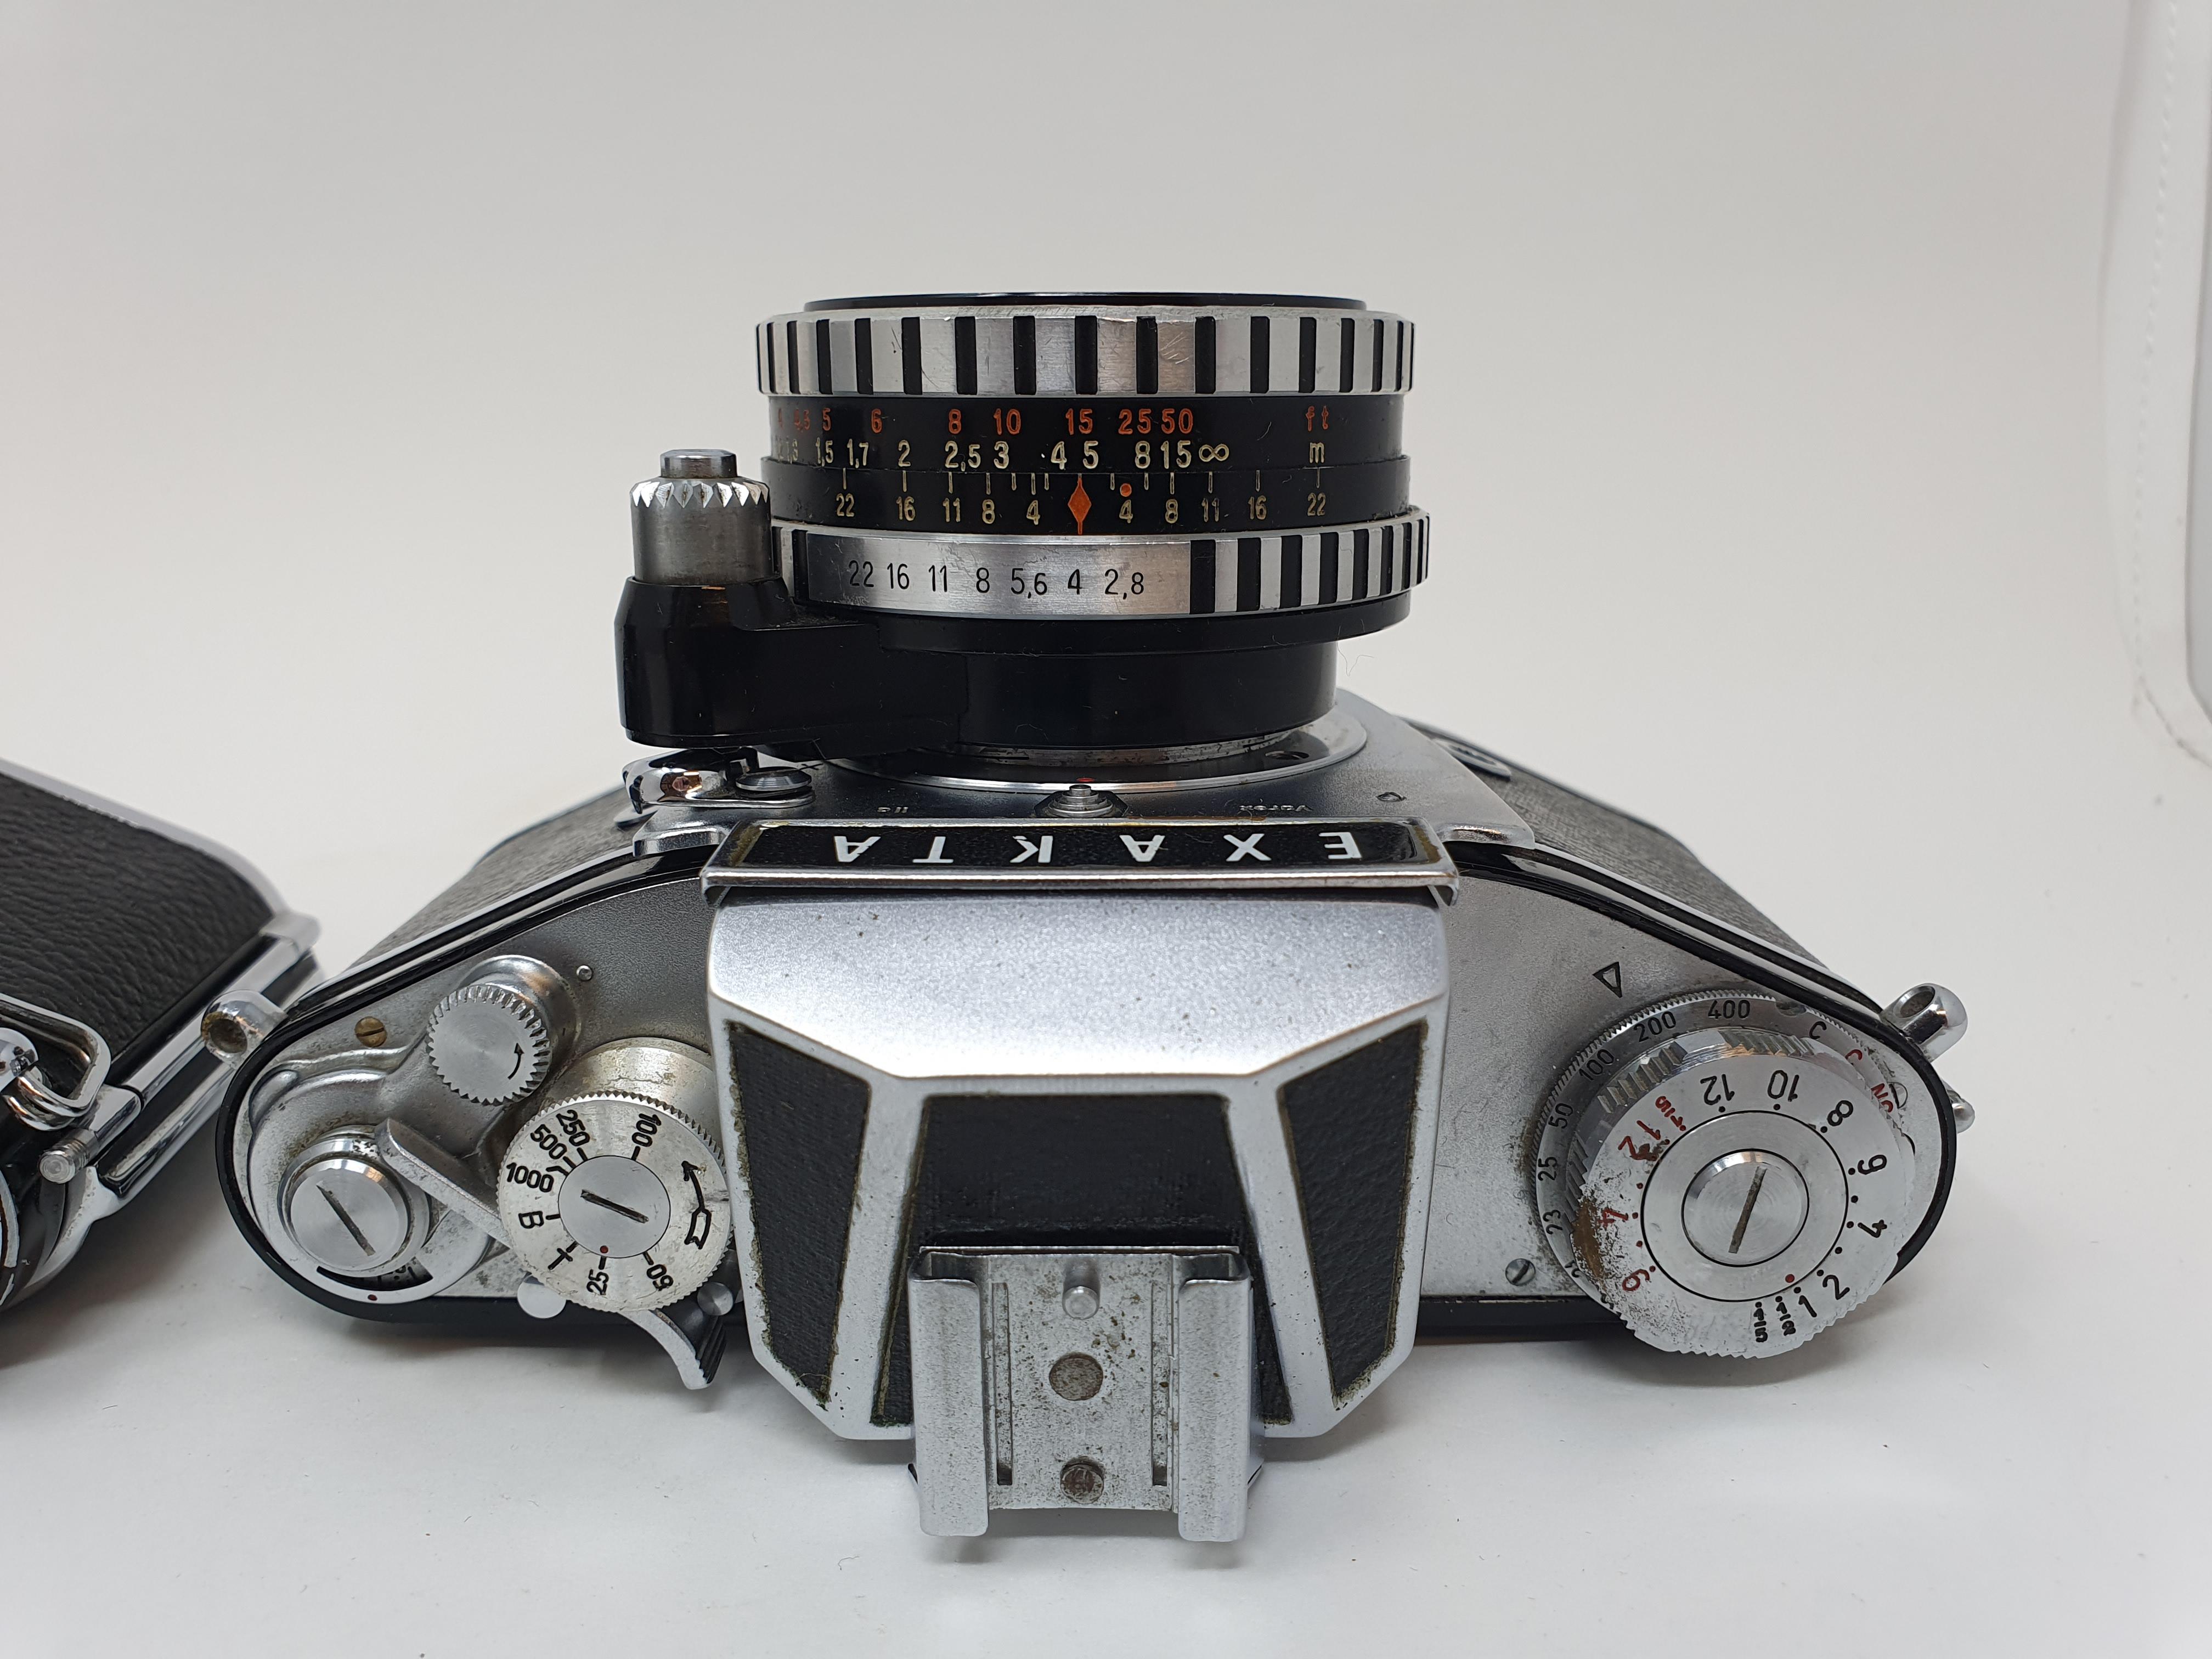 An Exakta Varex 11a camera, a VX 1000 camera body and a Varex IIb camera (3) Provenance: Part of a - Image 2 of 6